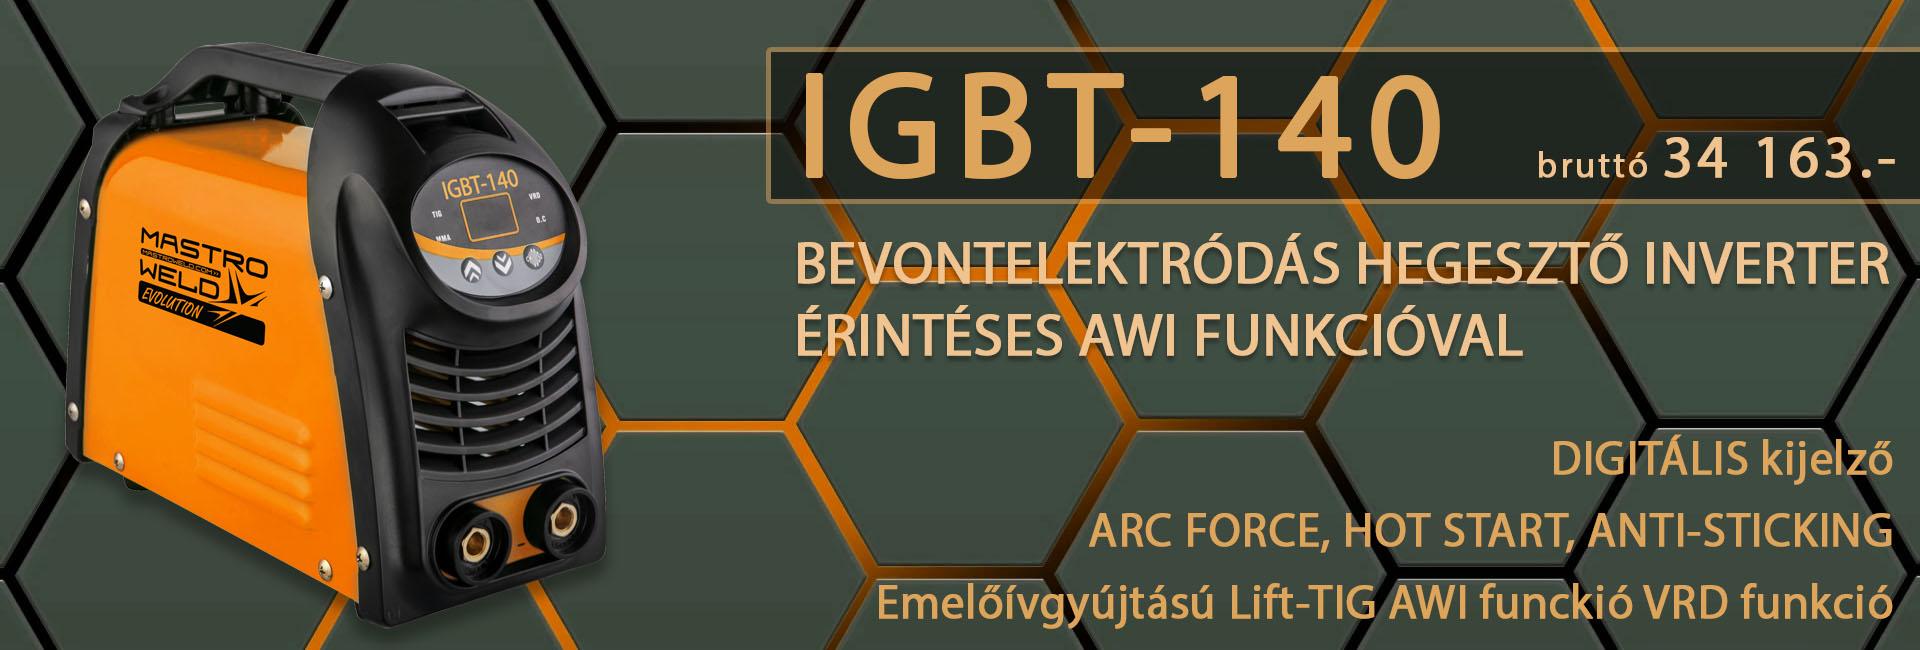 IGBT-140